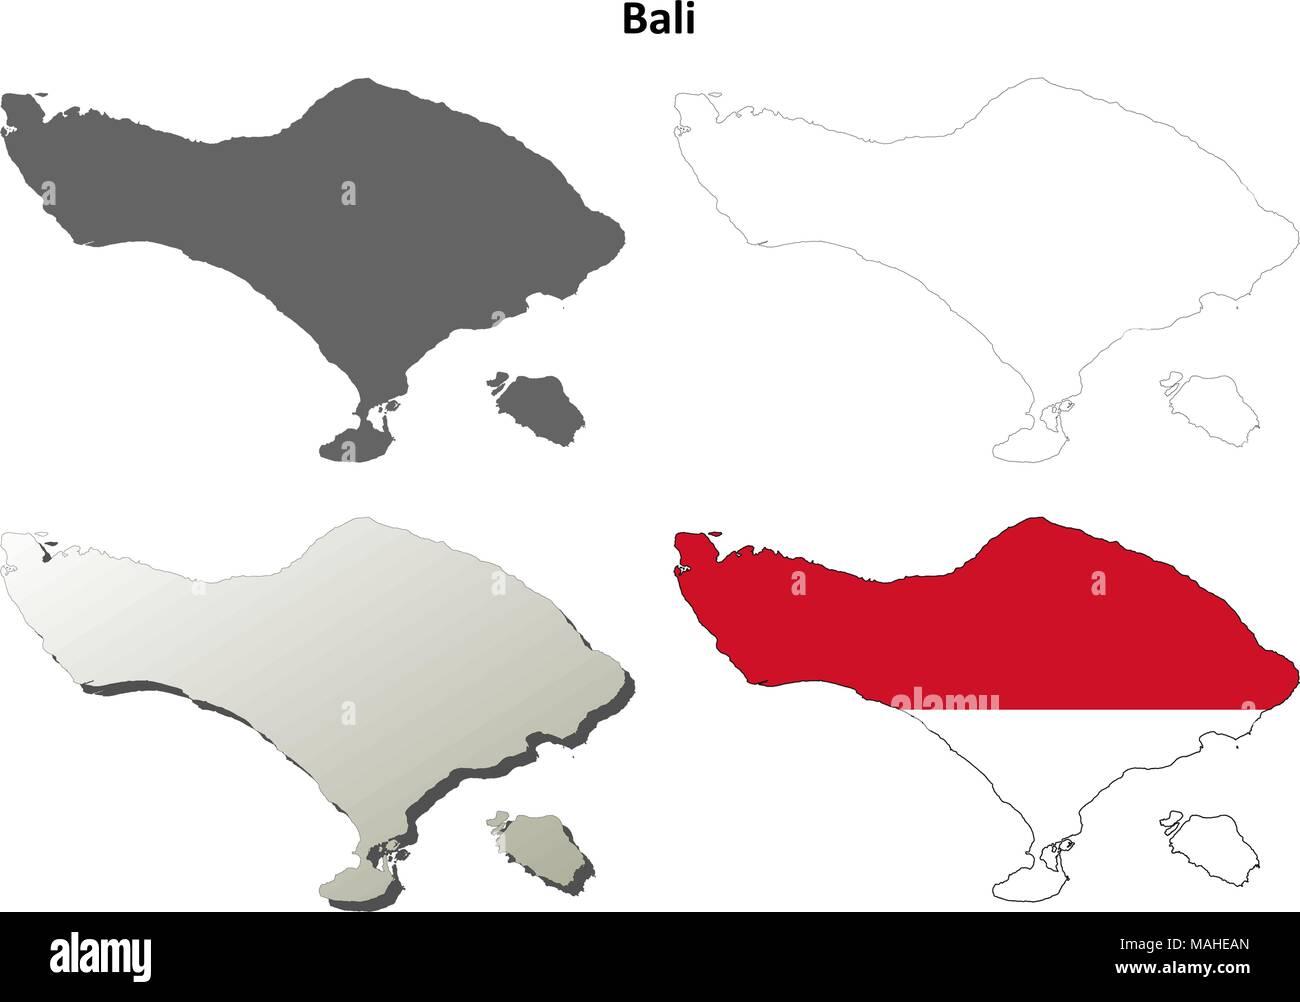 Carte Muette Bali.Jeu De Carte Muette De Bali Vecteurs Et Illustration Image